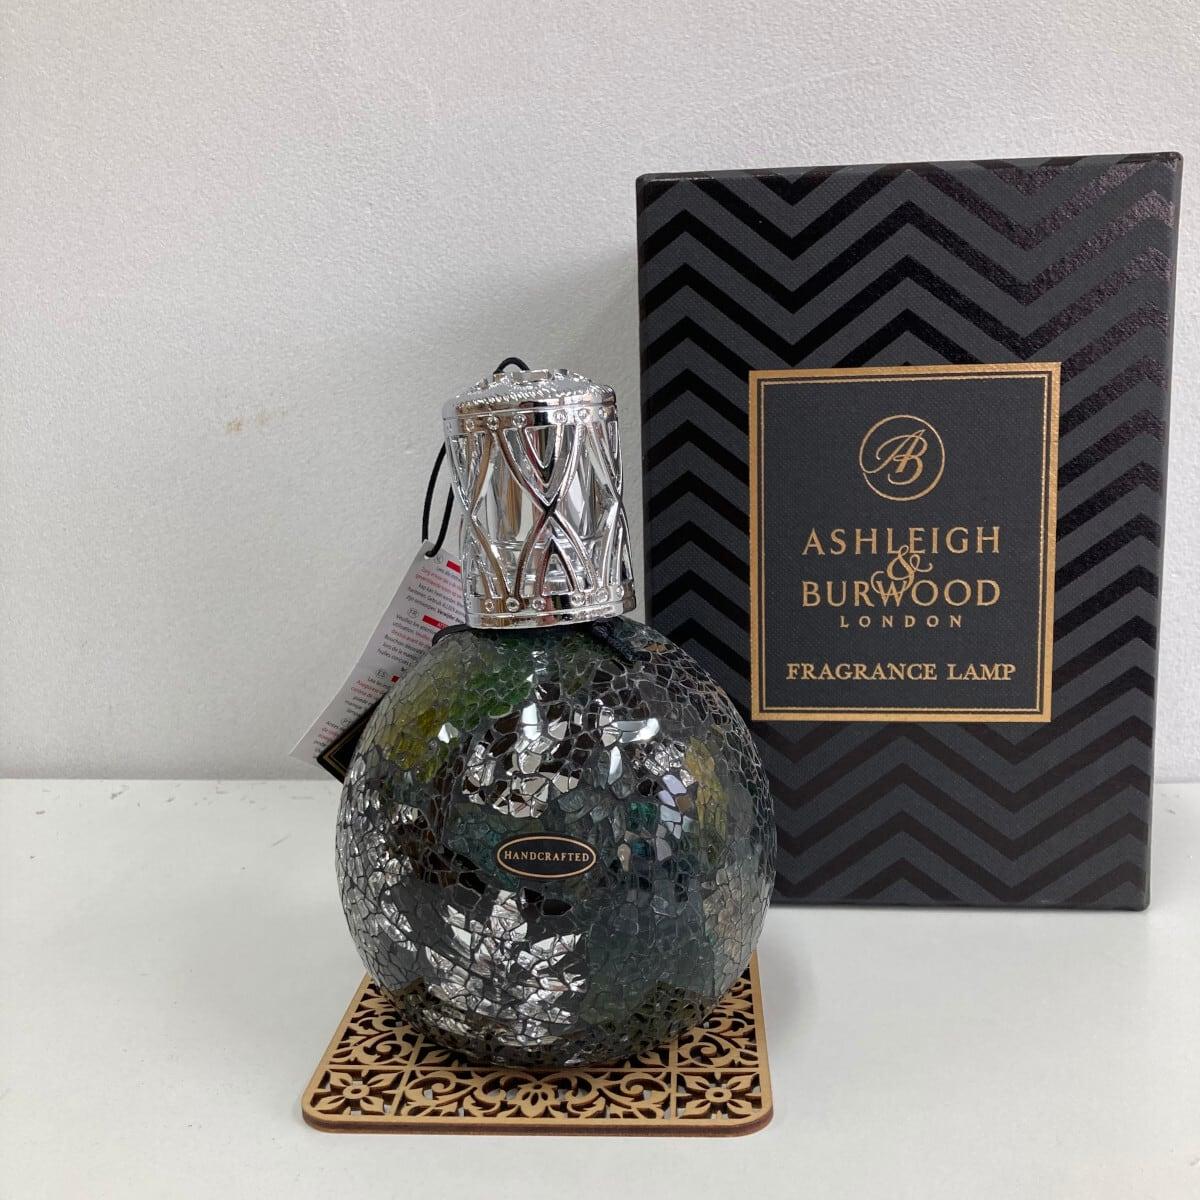 Ashleigh&Burwood(アシュレイ&バーウッド) アロマ フレグランスランプ ミントxブラウン 取扱店 人気 香り 効果 除菌 使い方 お手入れ方法